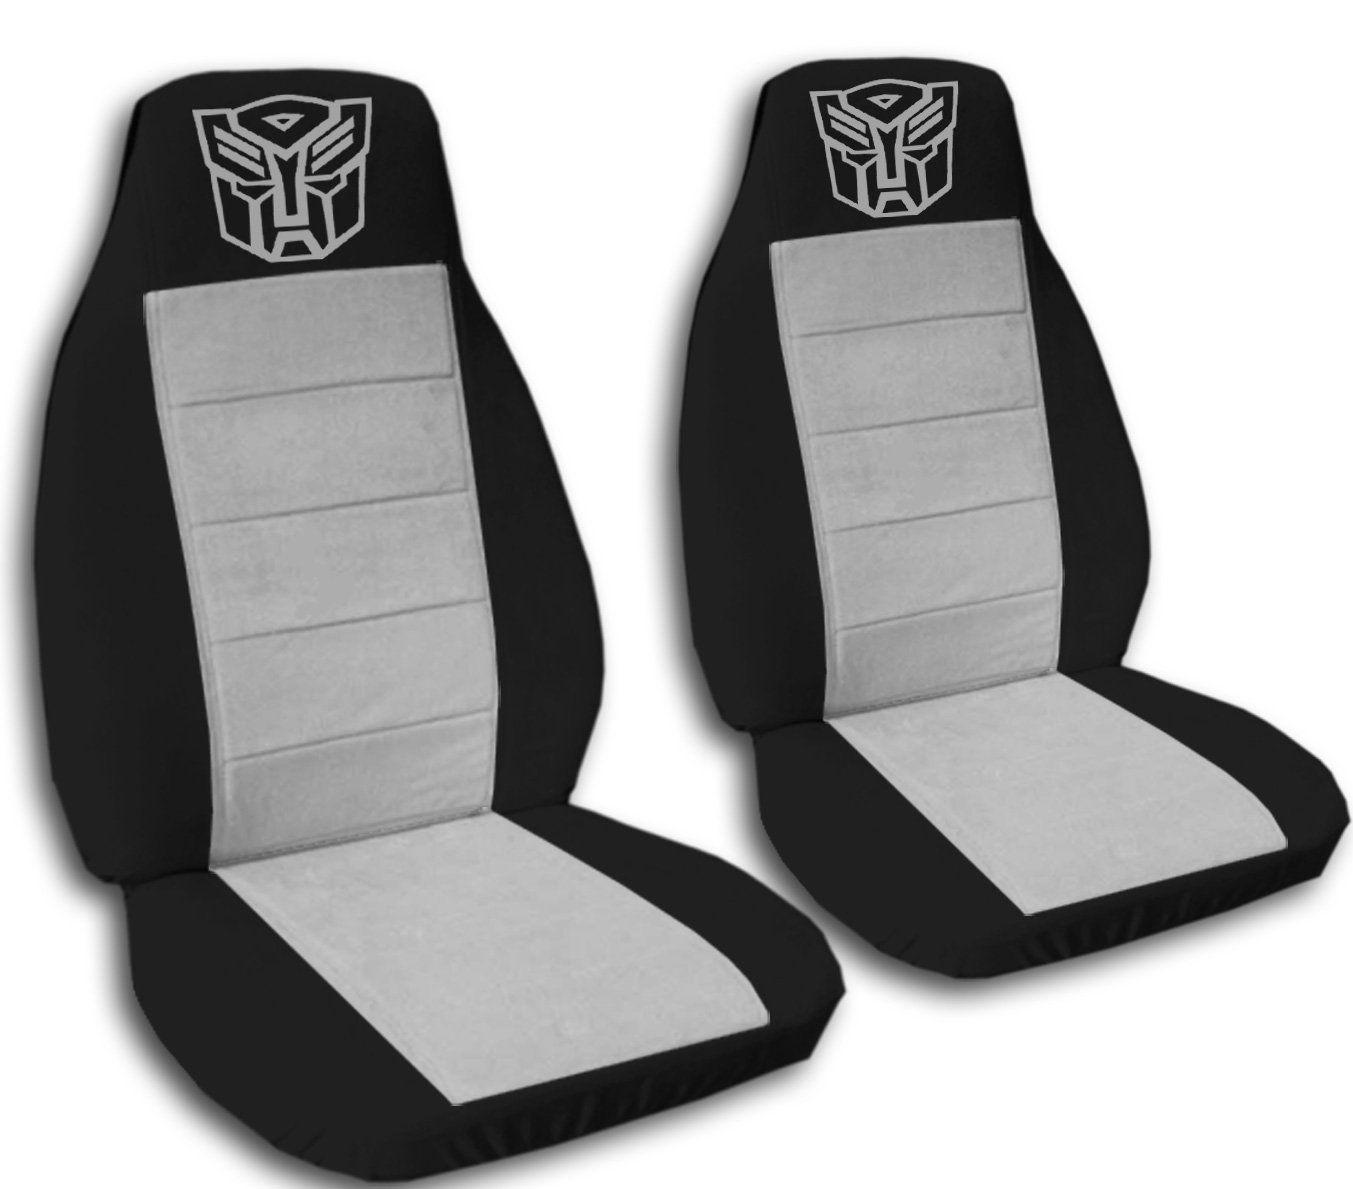 Transformers Car Seat Cover Accessories Car Accessories